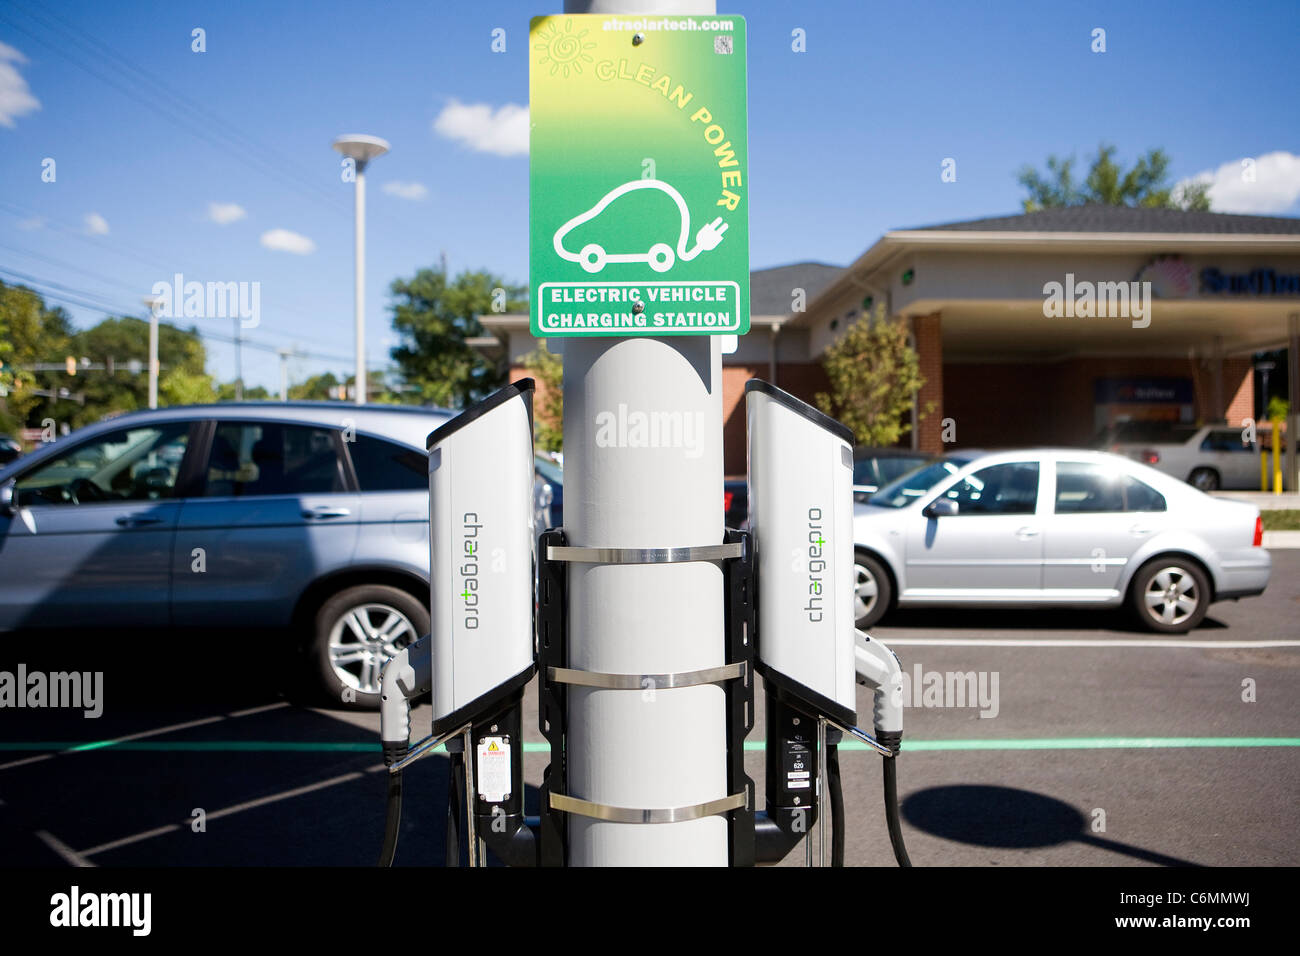 Un cargador de coche eléctrico alimentado con energía solar. Imagen De Stock